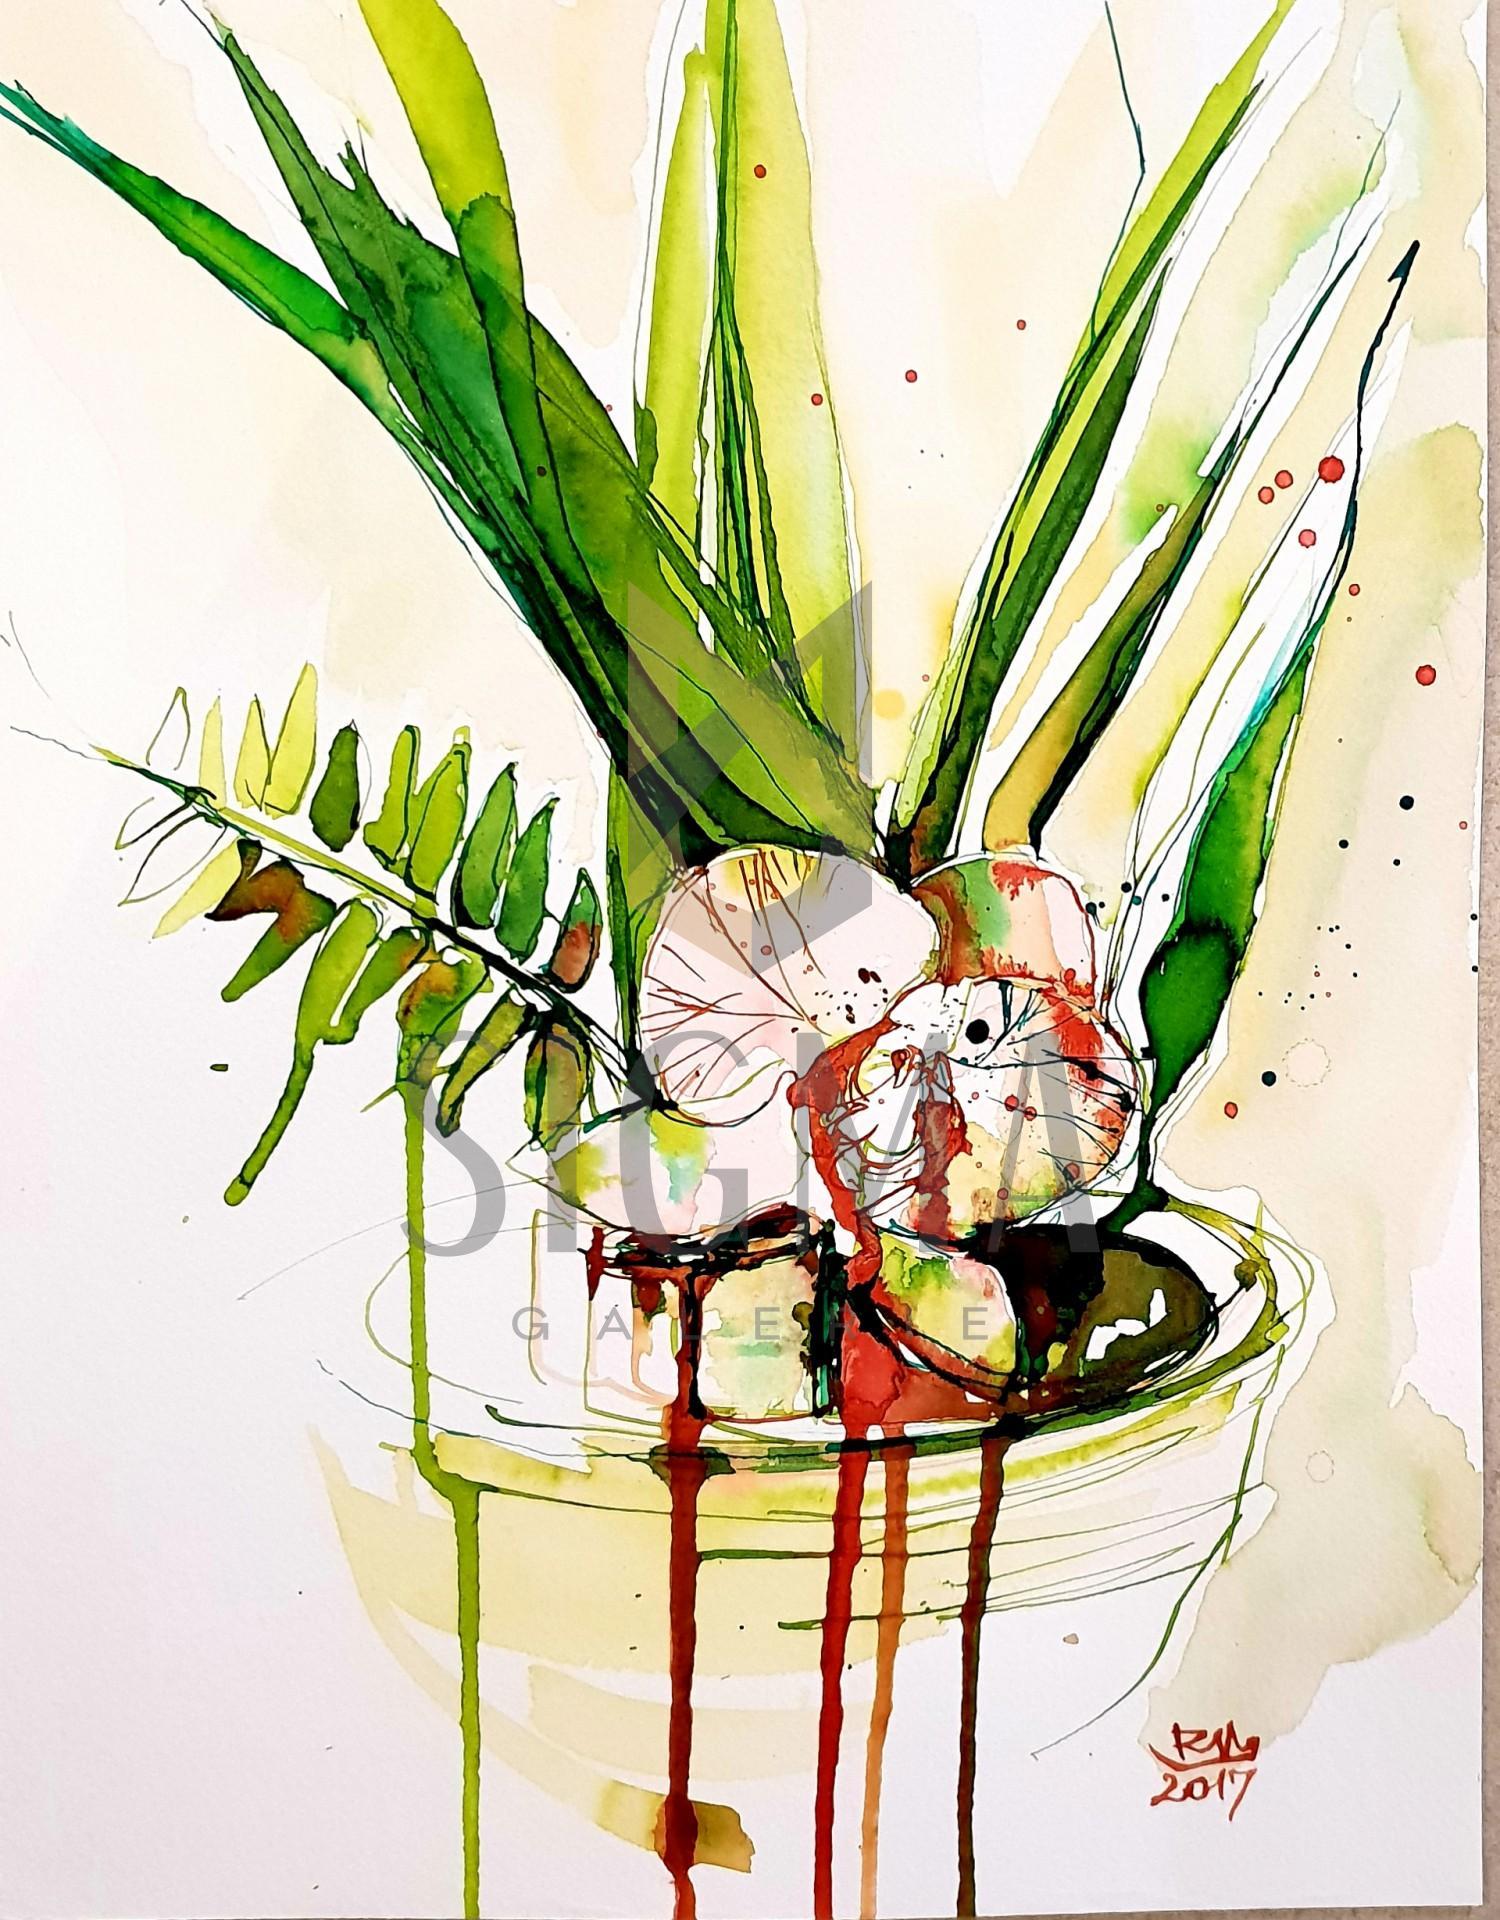 Tablou, Flori - Orhidee, autor: Raluca Morariu, tus si acuarela pe hartie Canson, dimensiuni: 32 x 25 cm